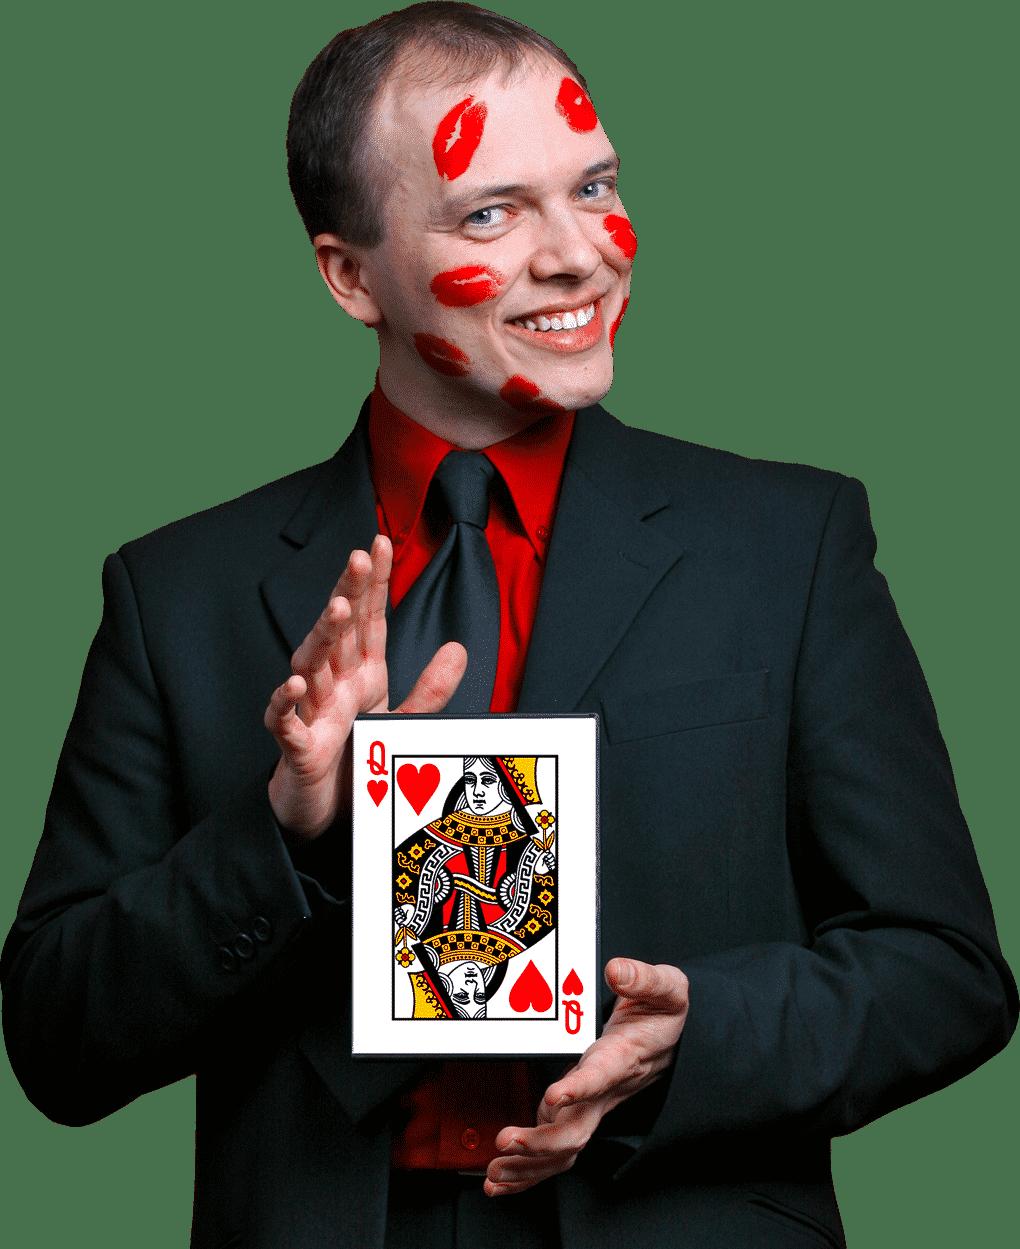 gala de magie festival Boris Wild magicien kiss act